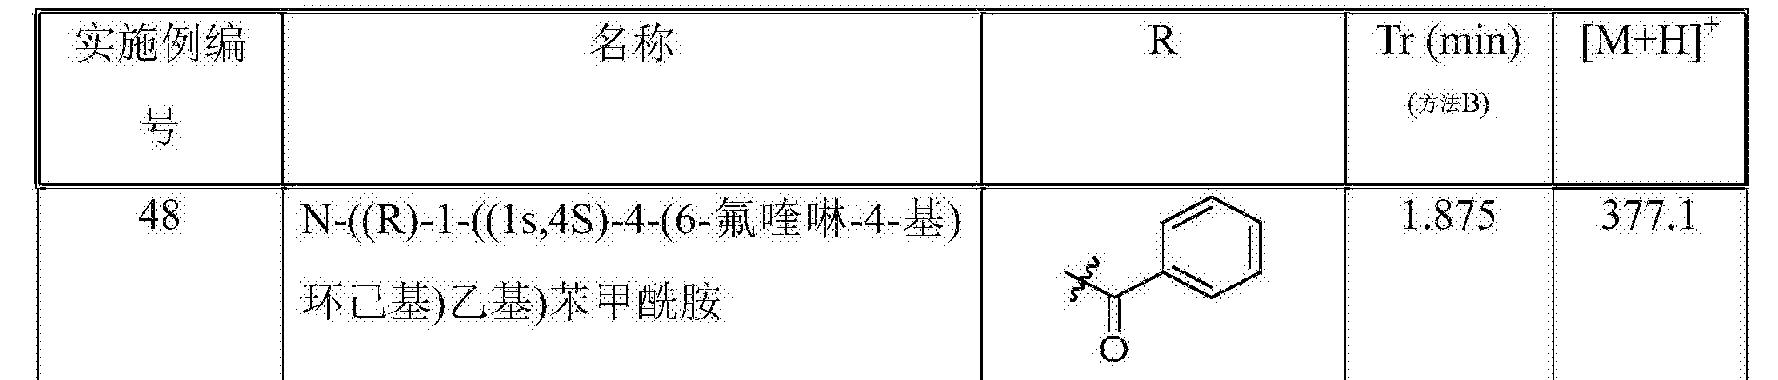 Figure CN106999450AD00713